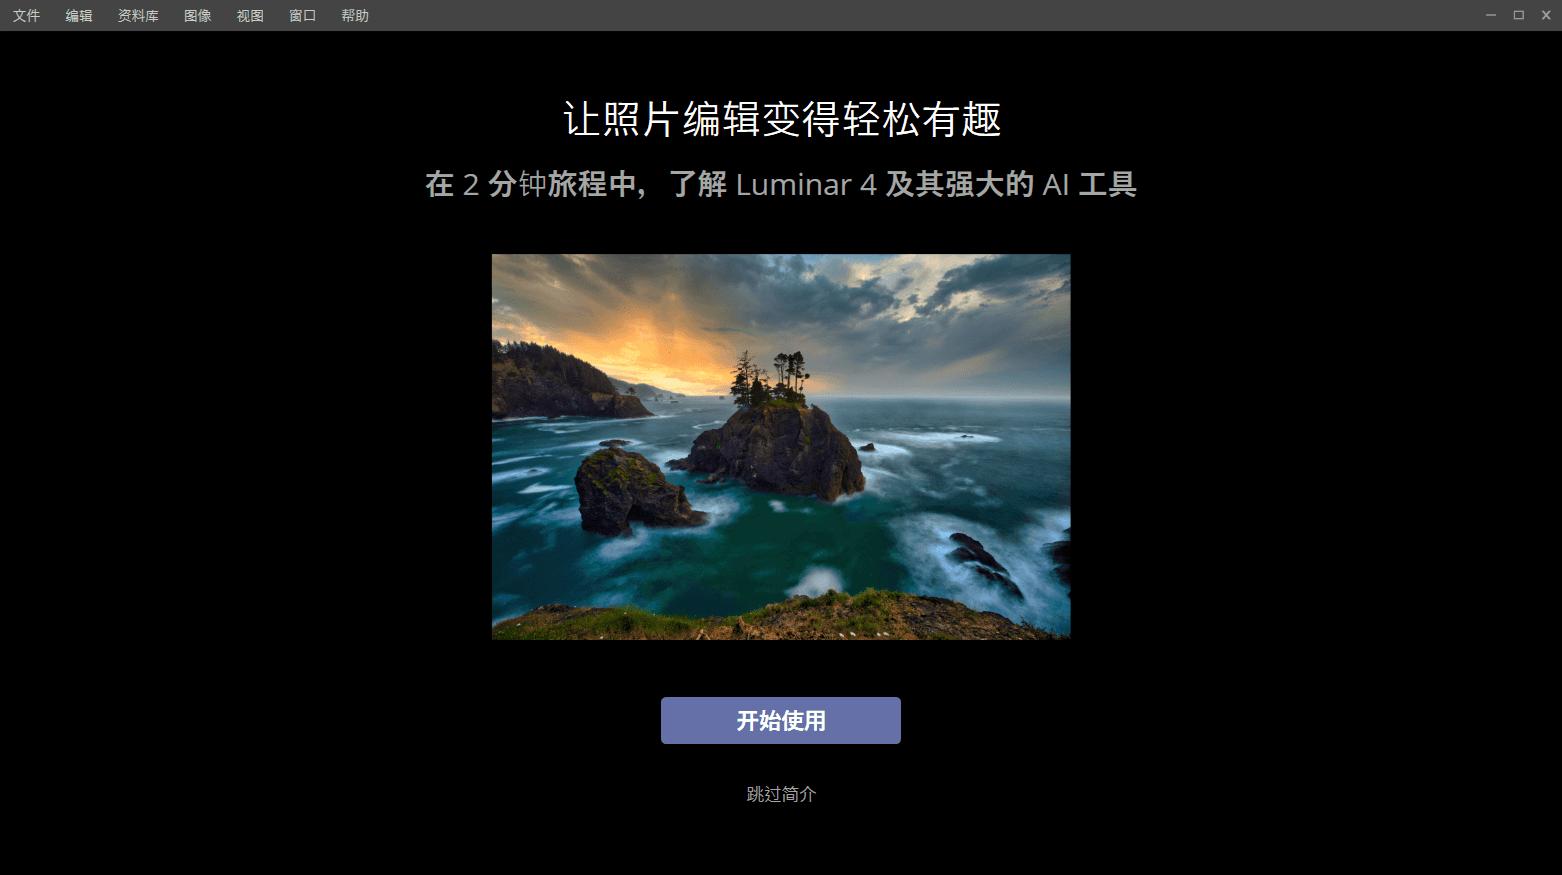 照片编辑器Luminar v4.3.0.6160